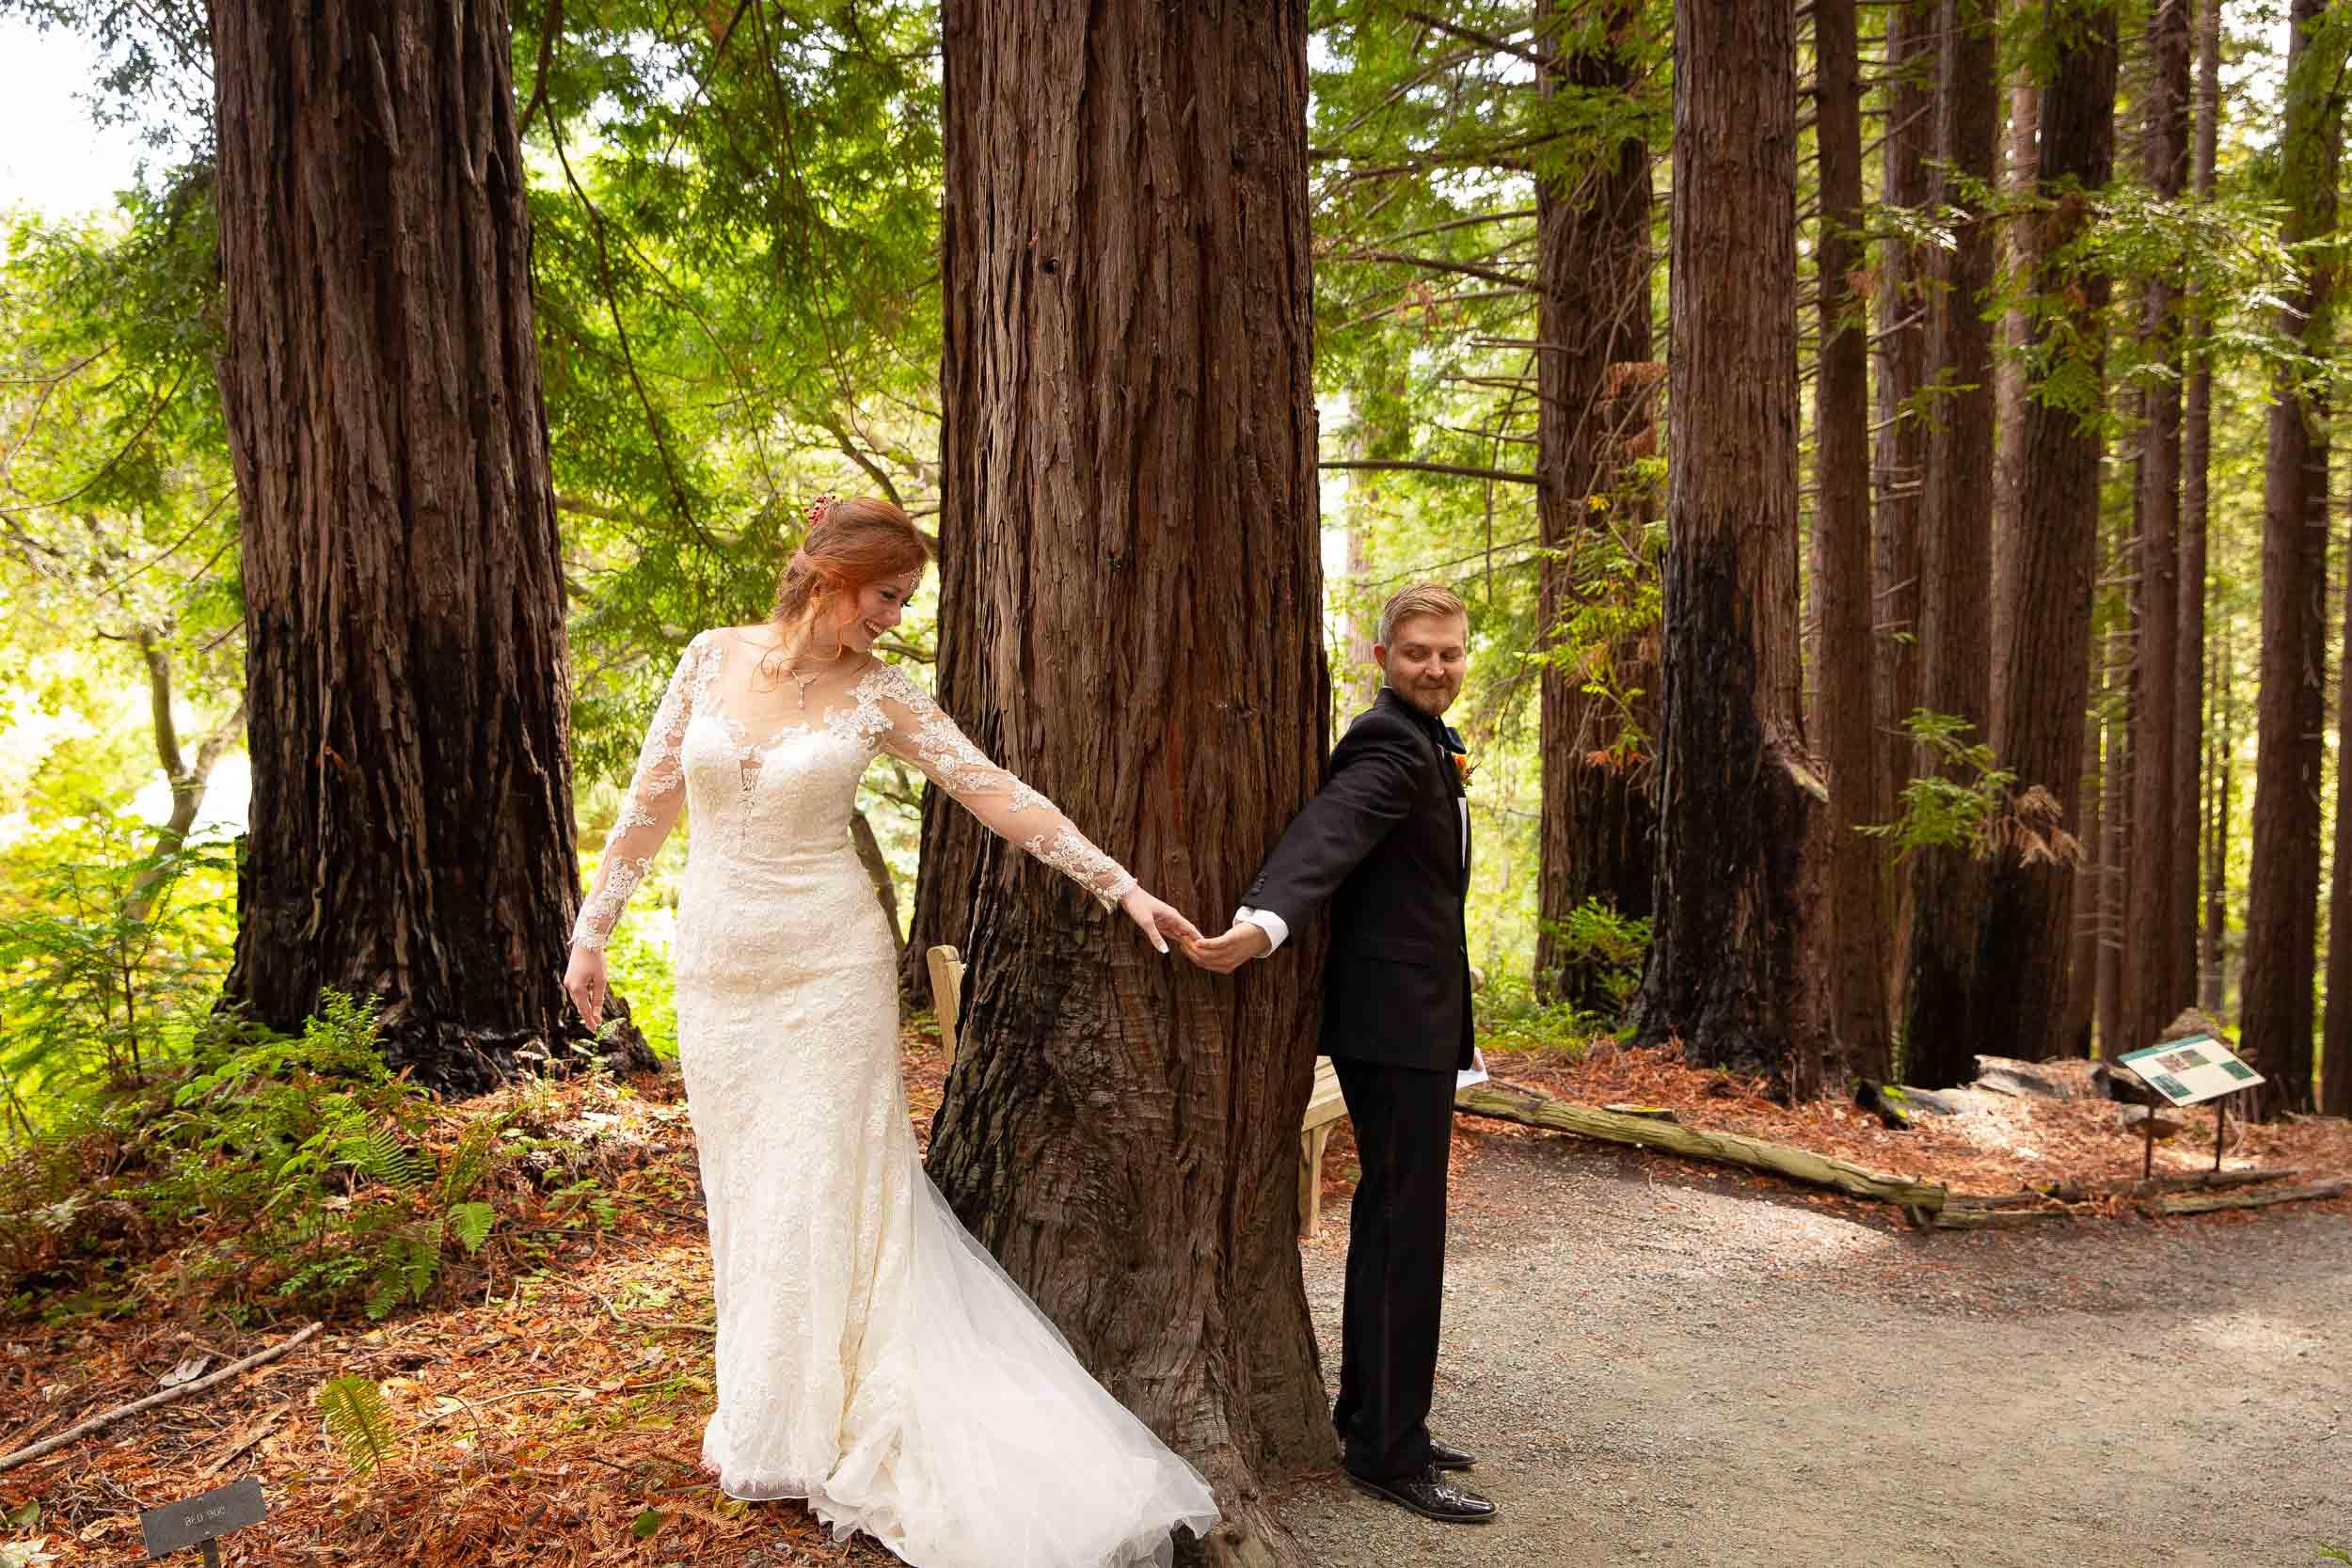 Berkeley Botanical Garden Wedding Ceremony in the Redwood Grove Ceremony and SF Bay Wedding Cruise Reception-21.jpg